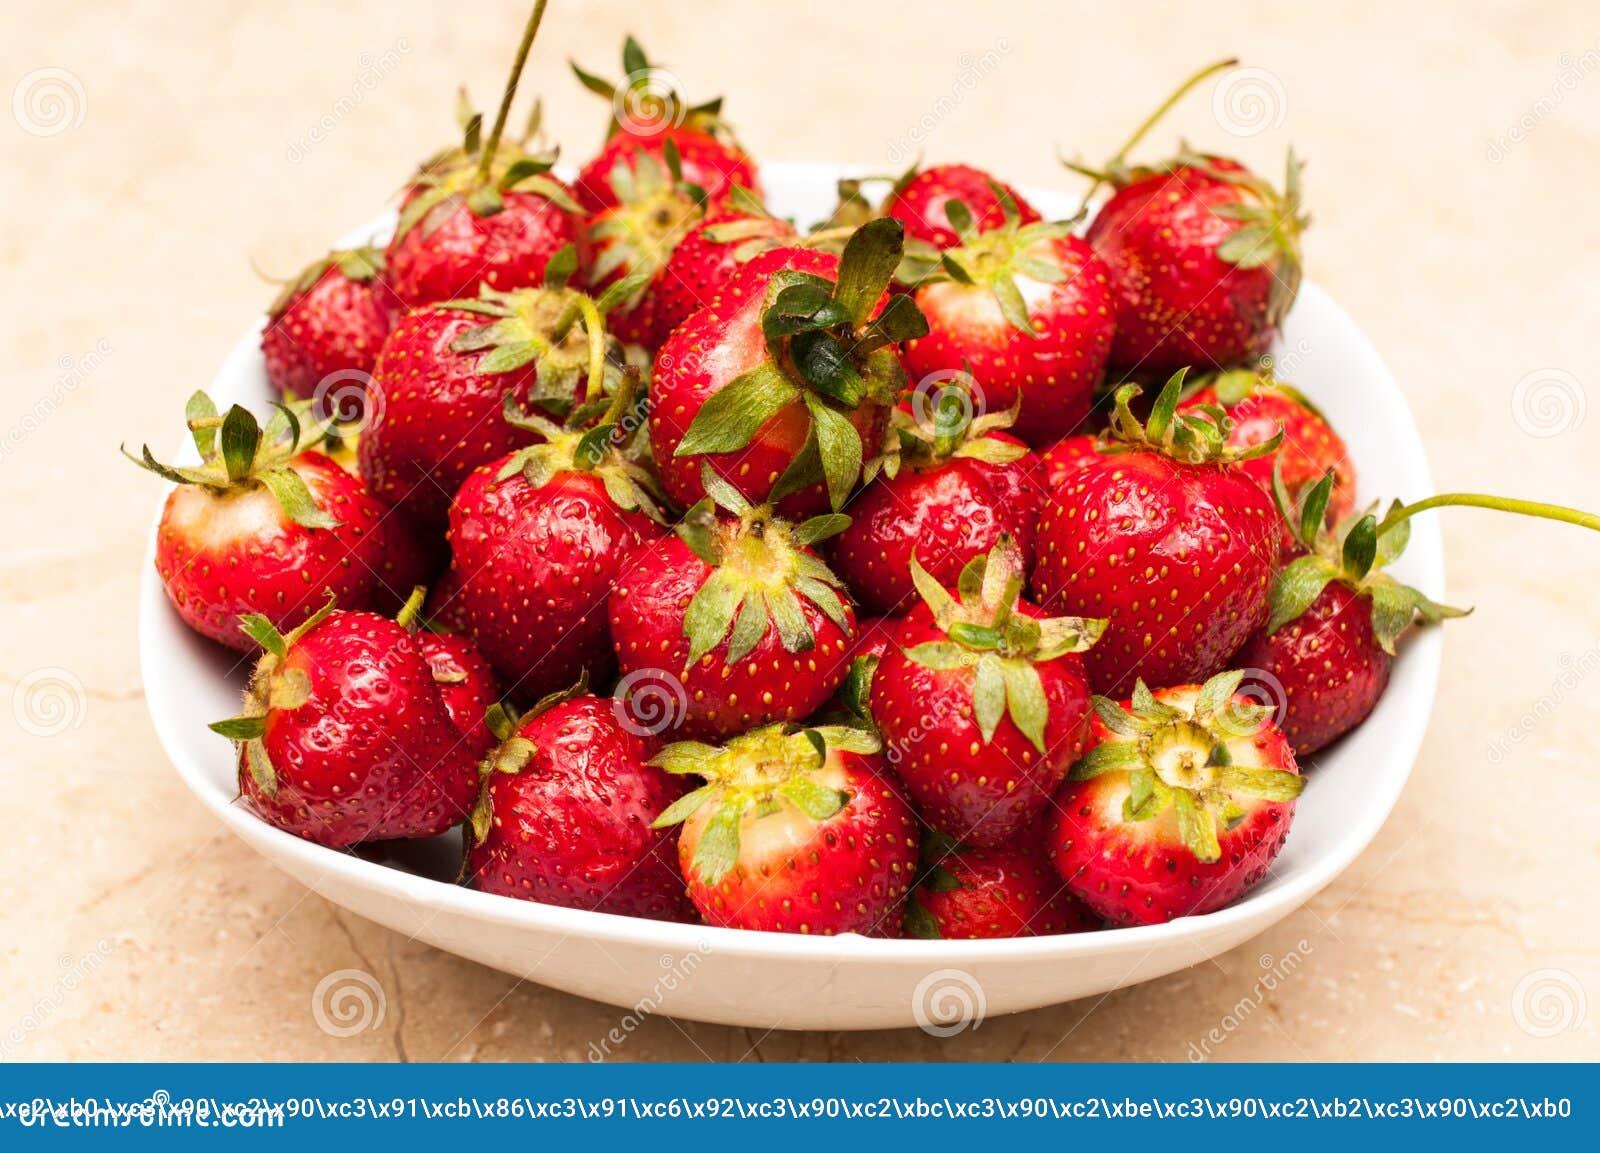 Organic strawberries fruit diet summer